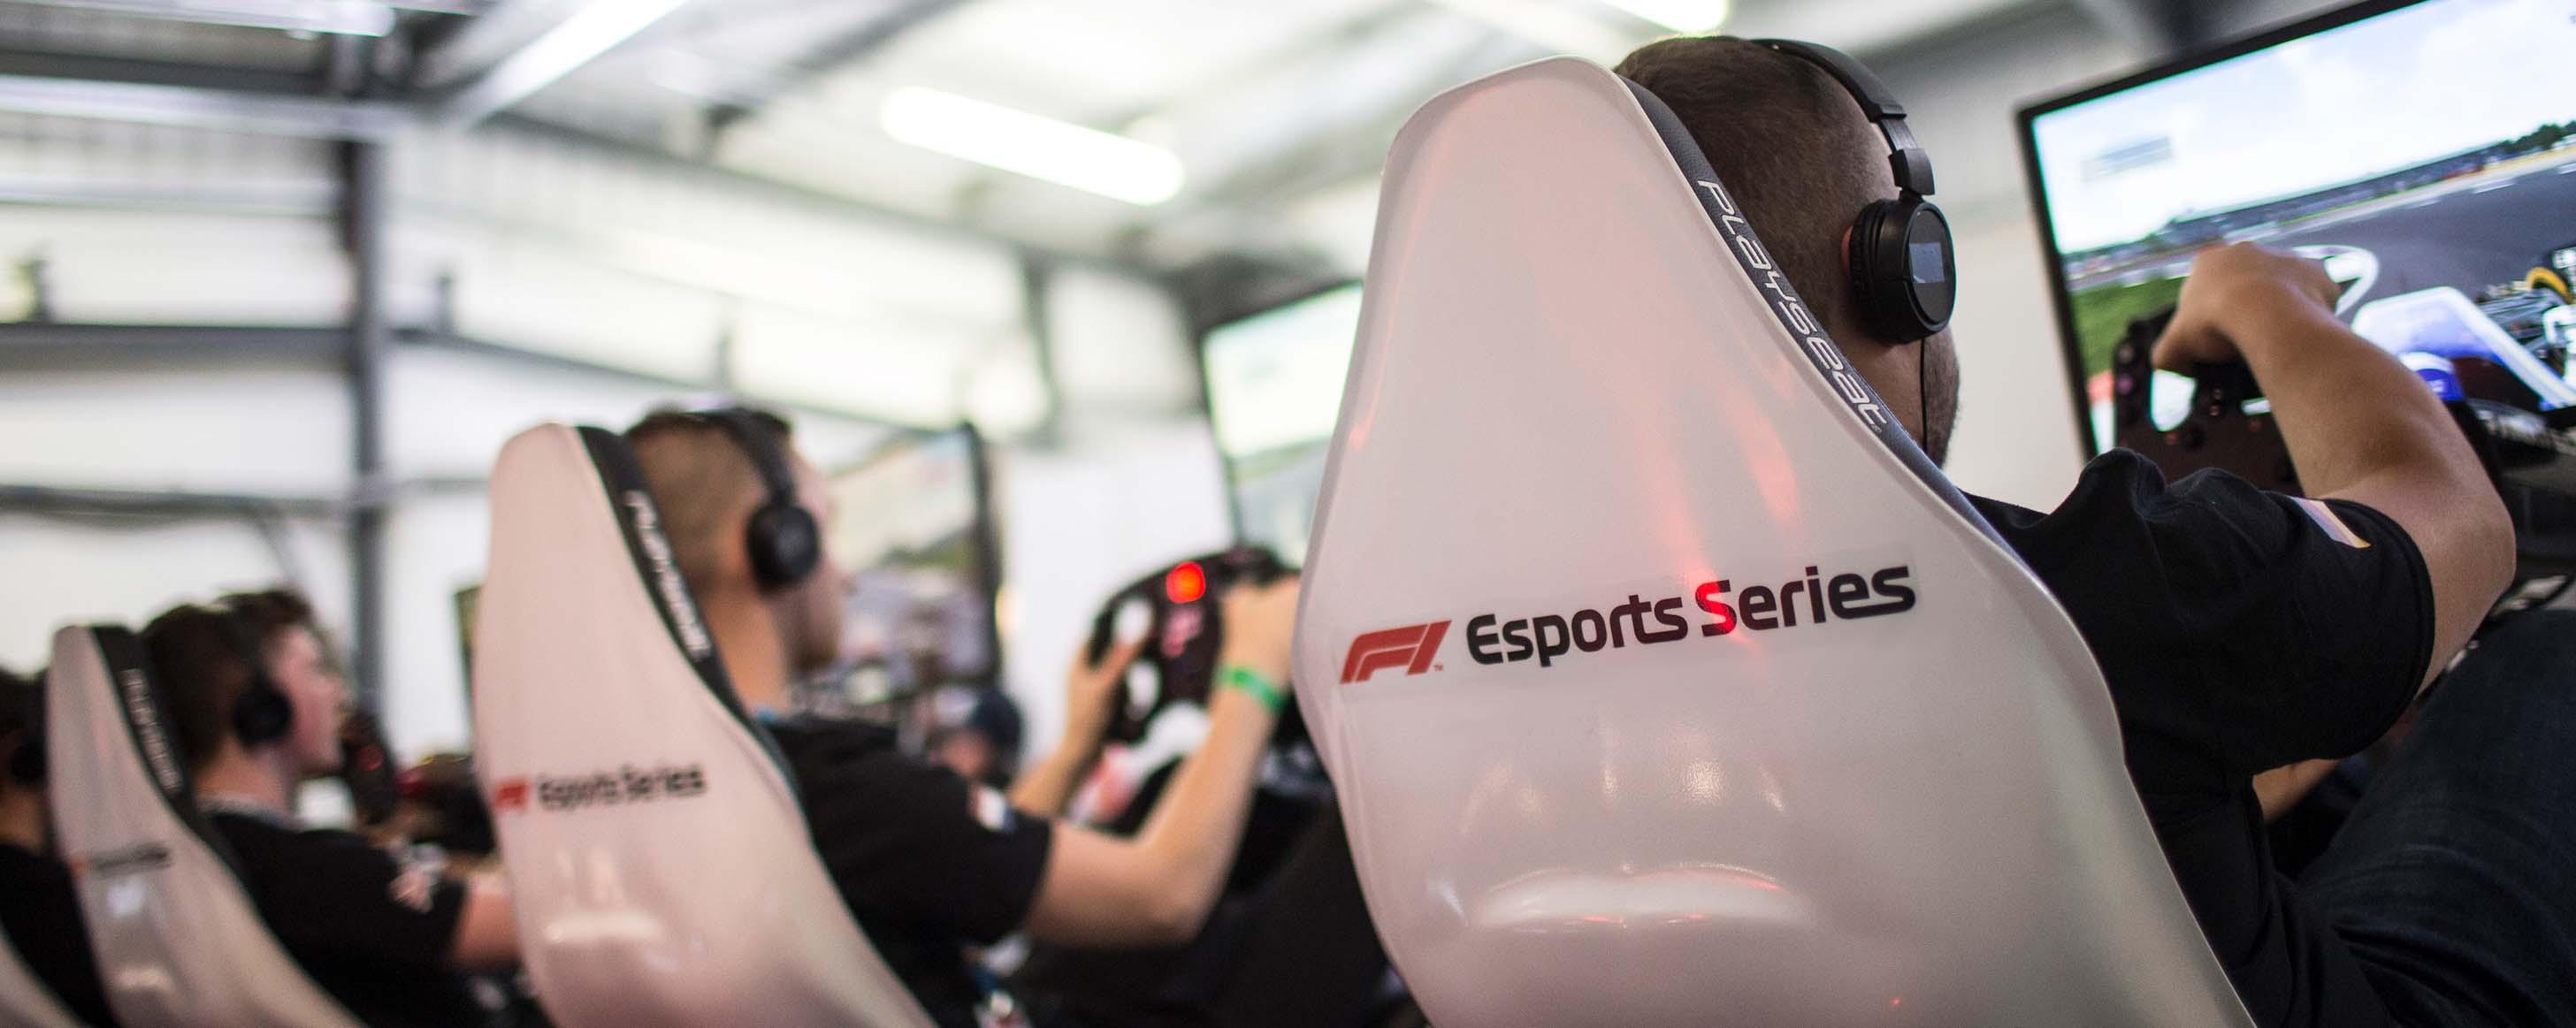 F1 Esports Series 2018: What's Next?